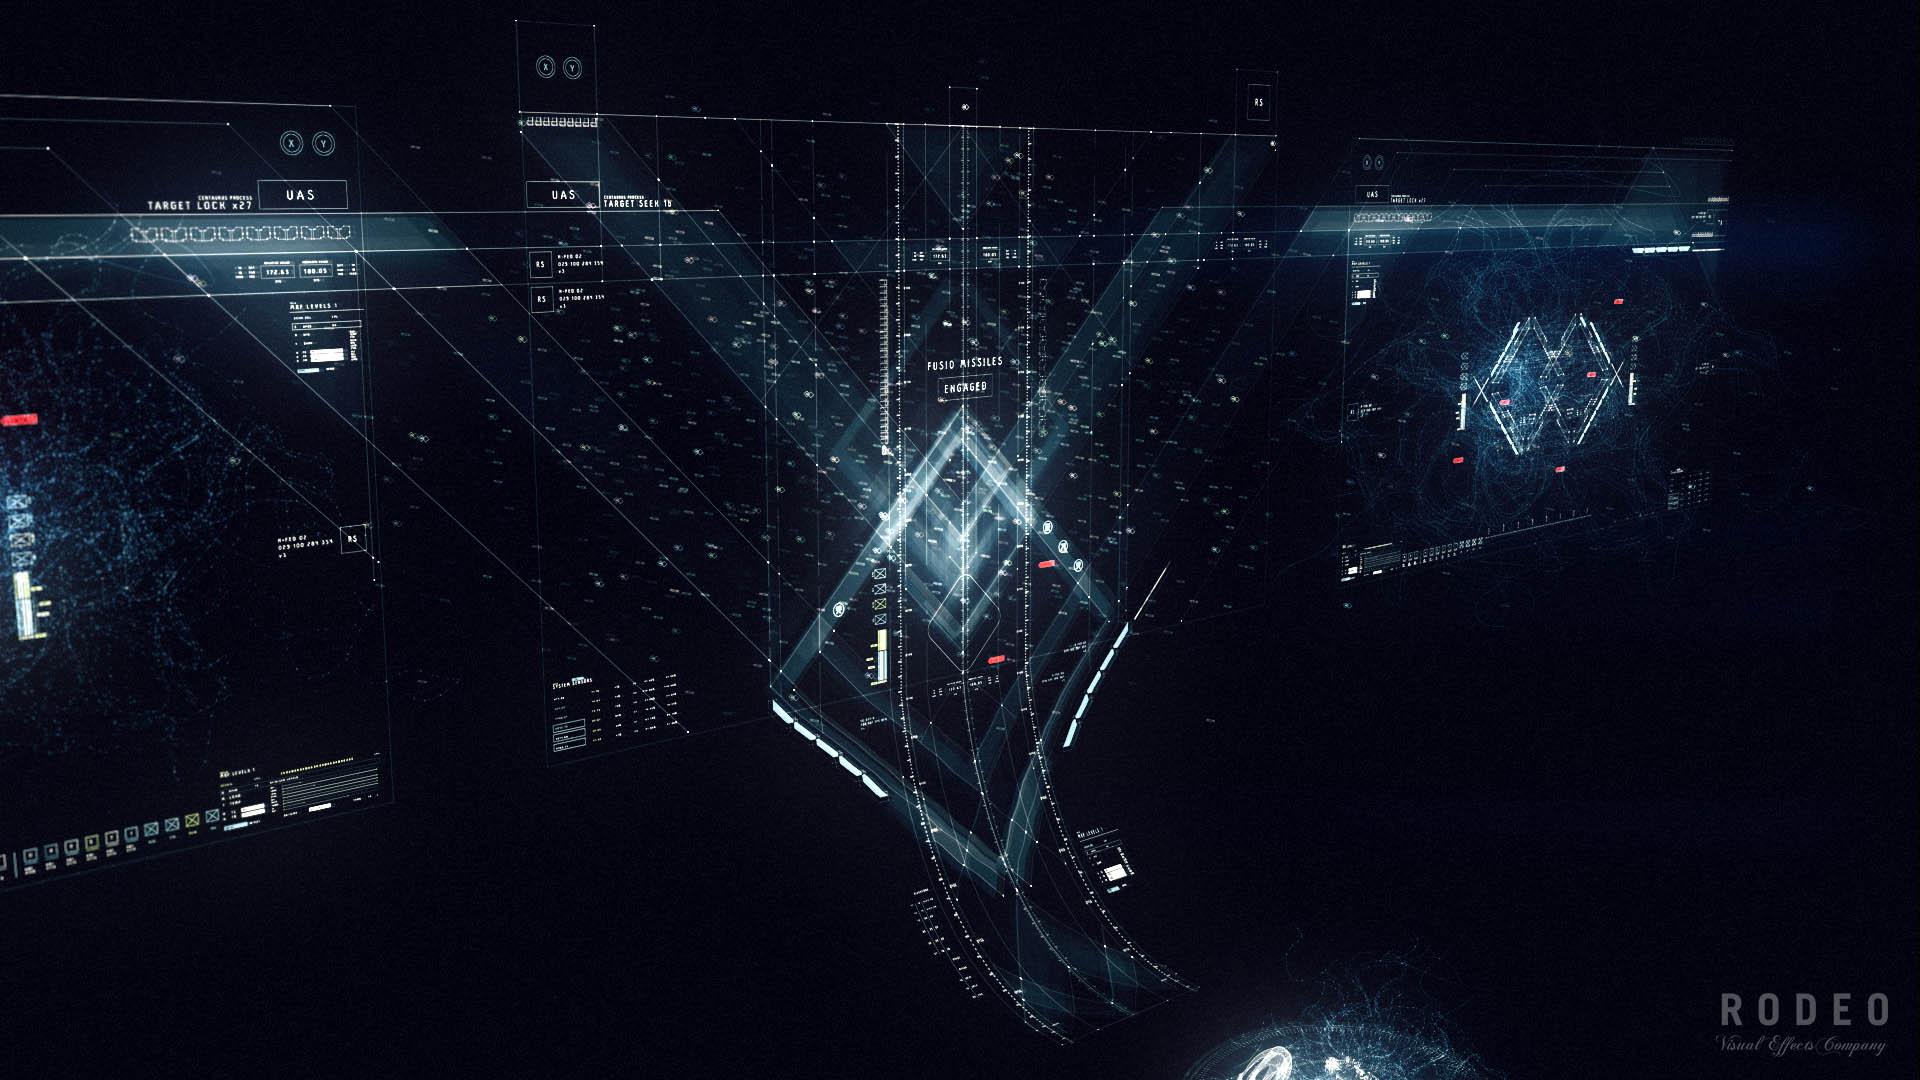 alphacontrolmg_warship_cpt_A_v001.0002_wm